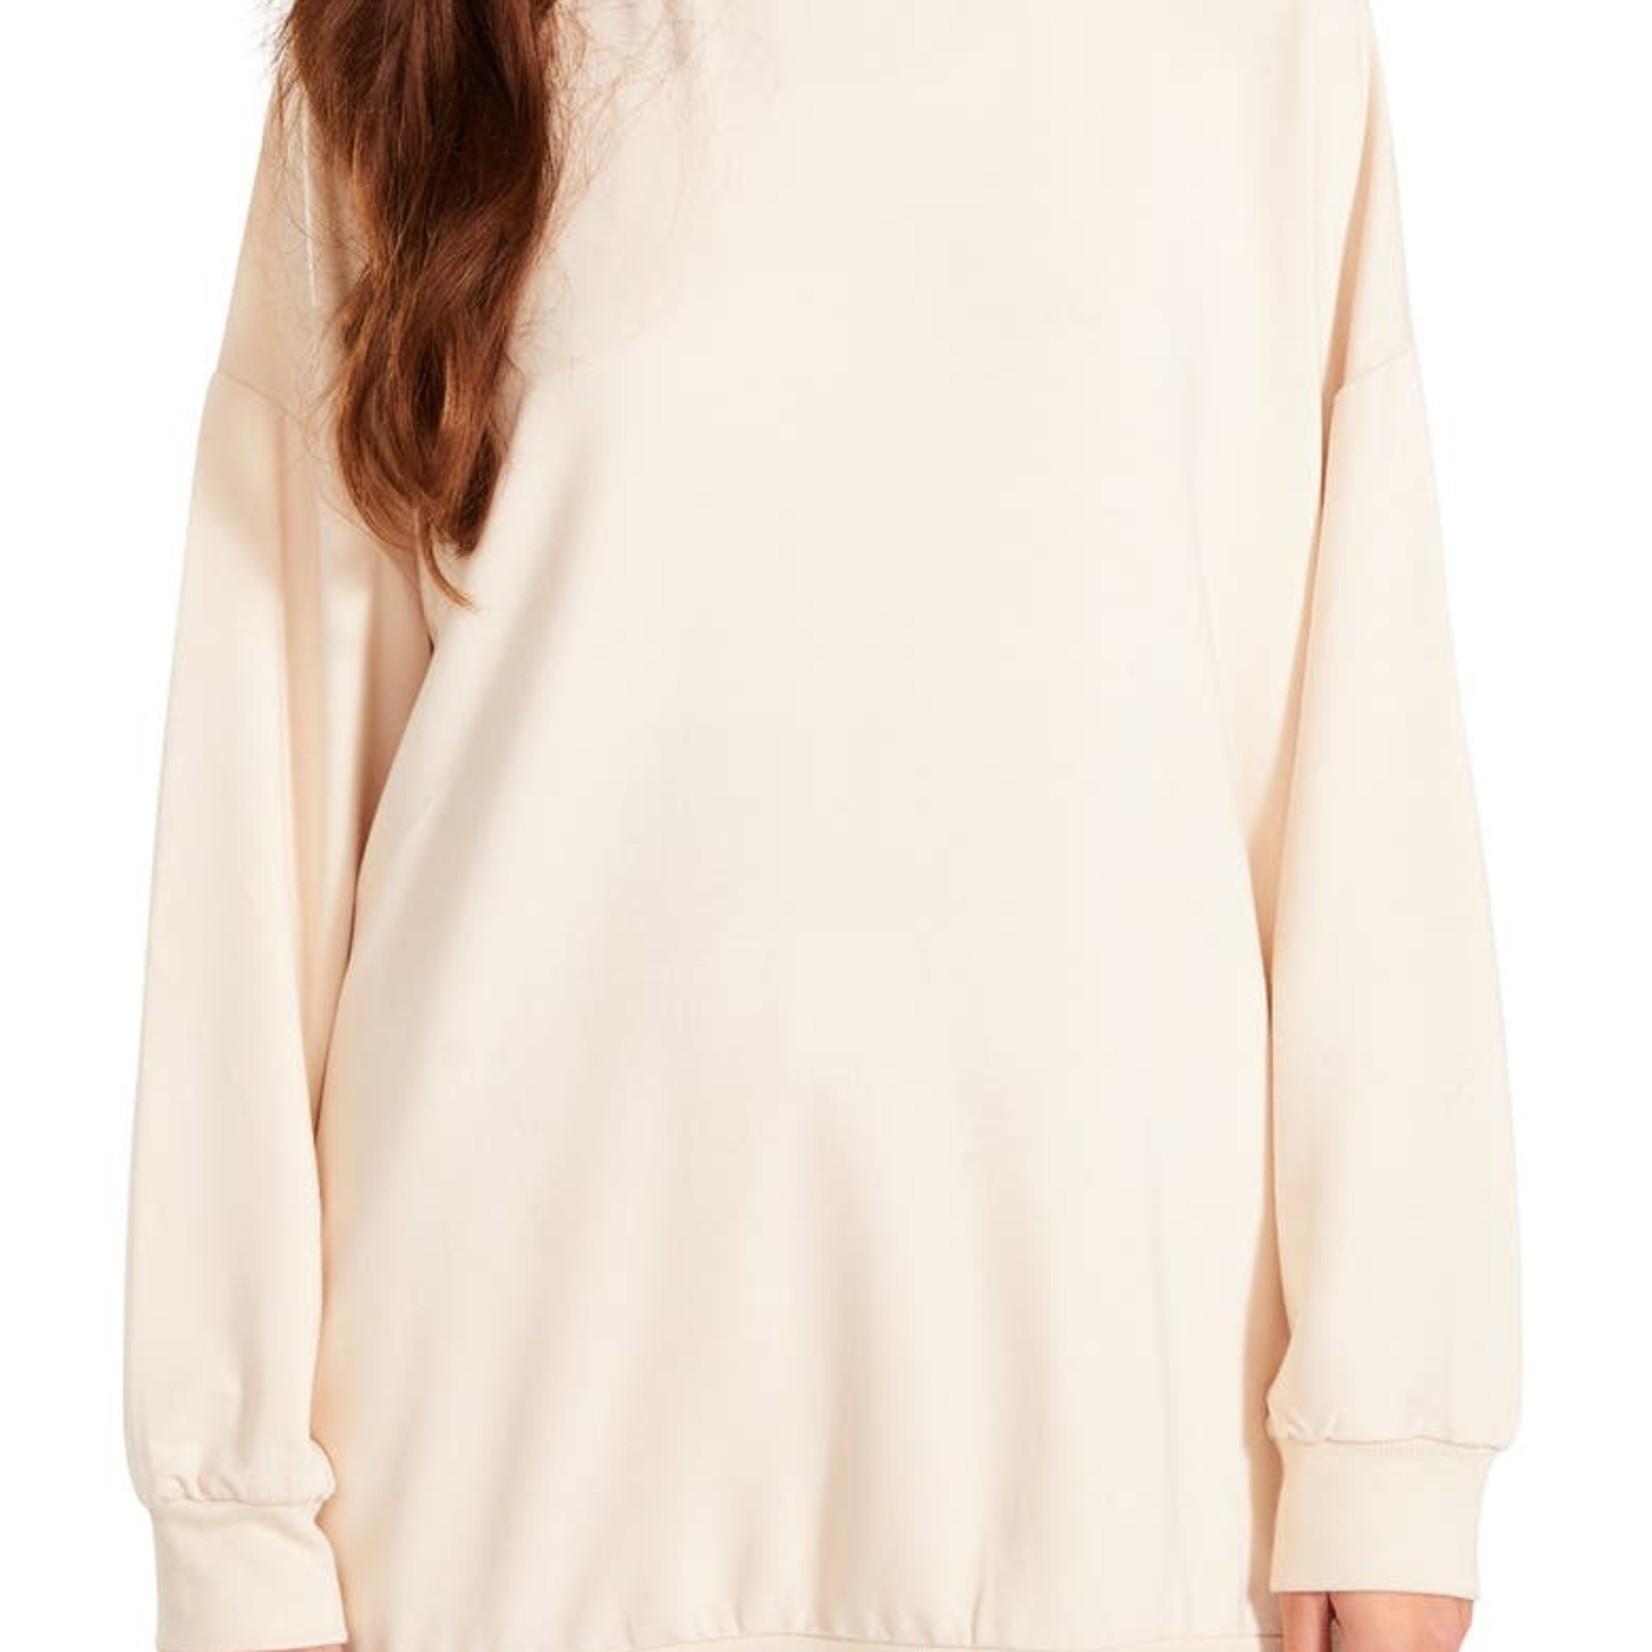 BB dakota Neck Question Sweatshirt BL305434